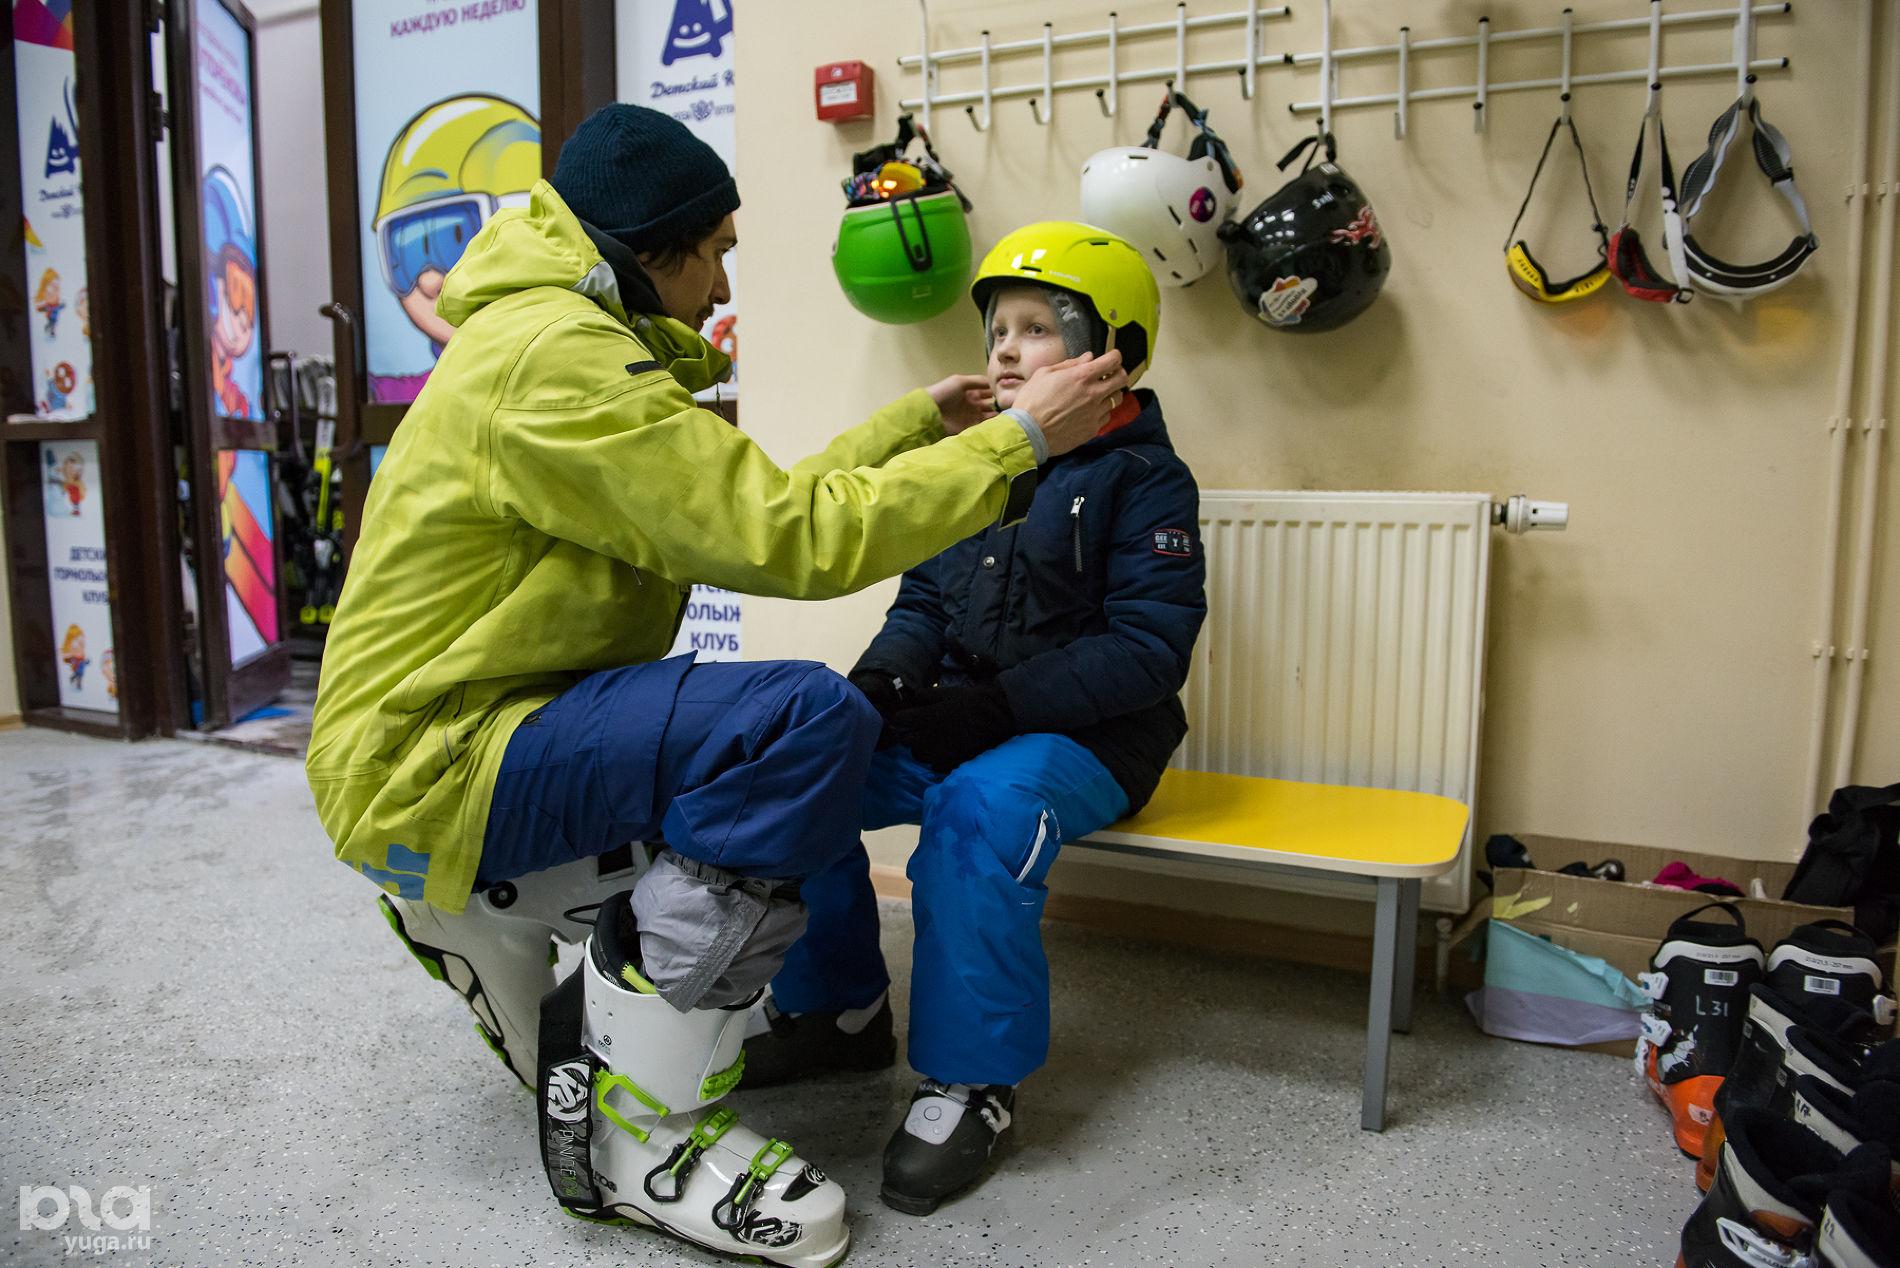 Слава Литвинов в пункте проката снаряжения ©Фото Екатерины Лызловой, Юга.ру